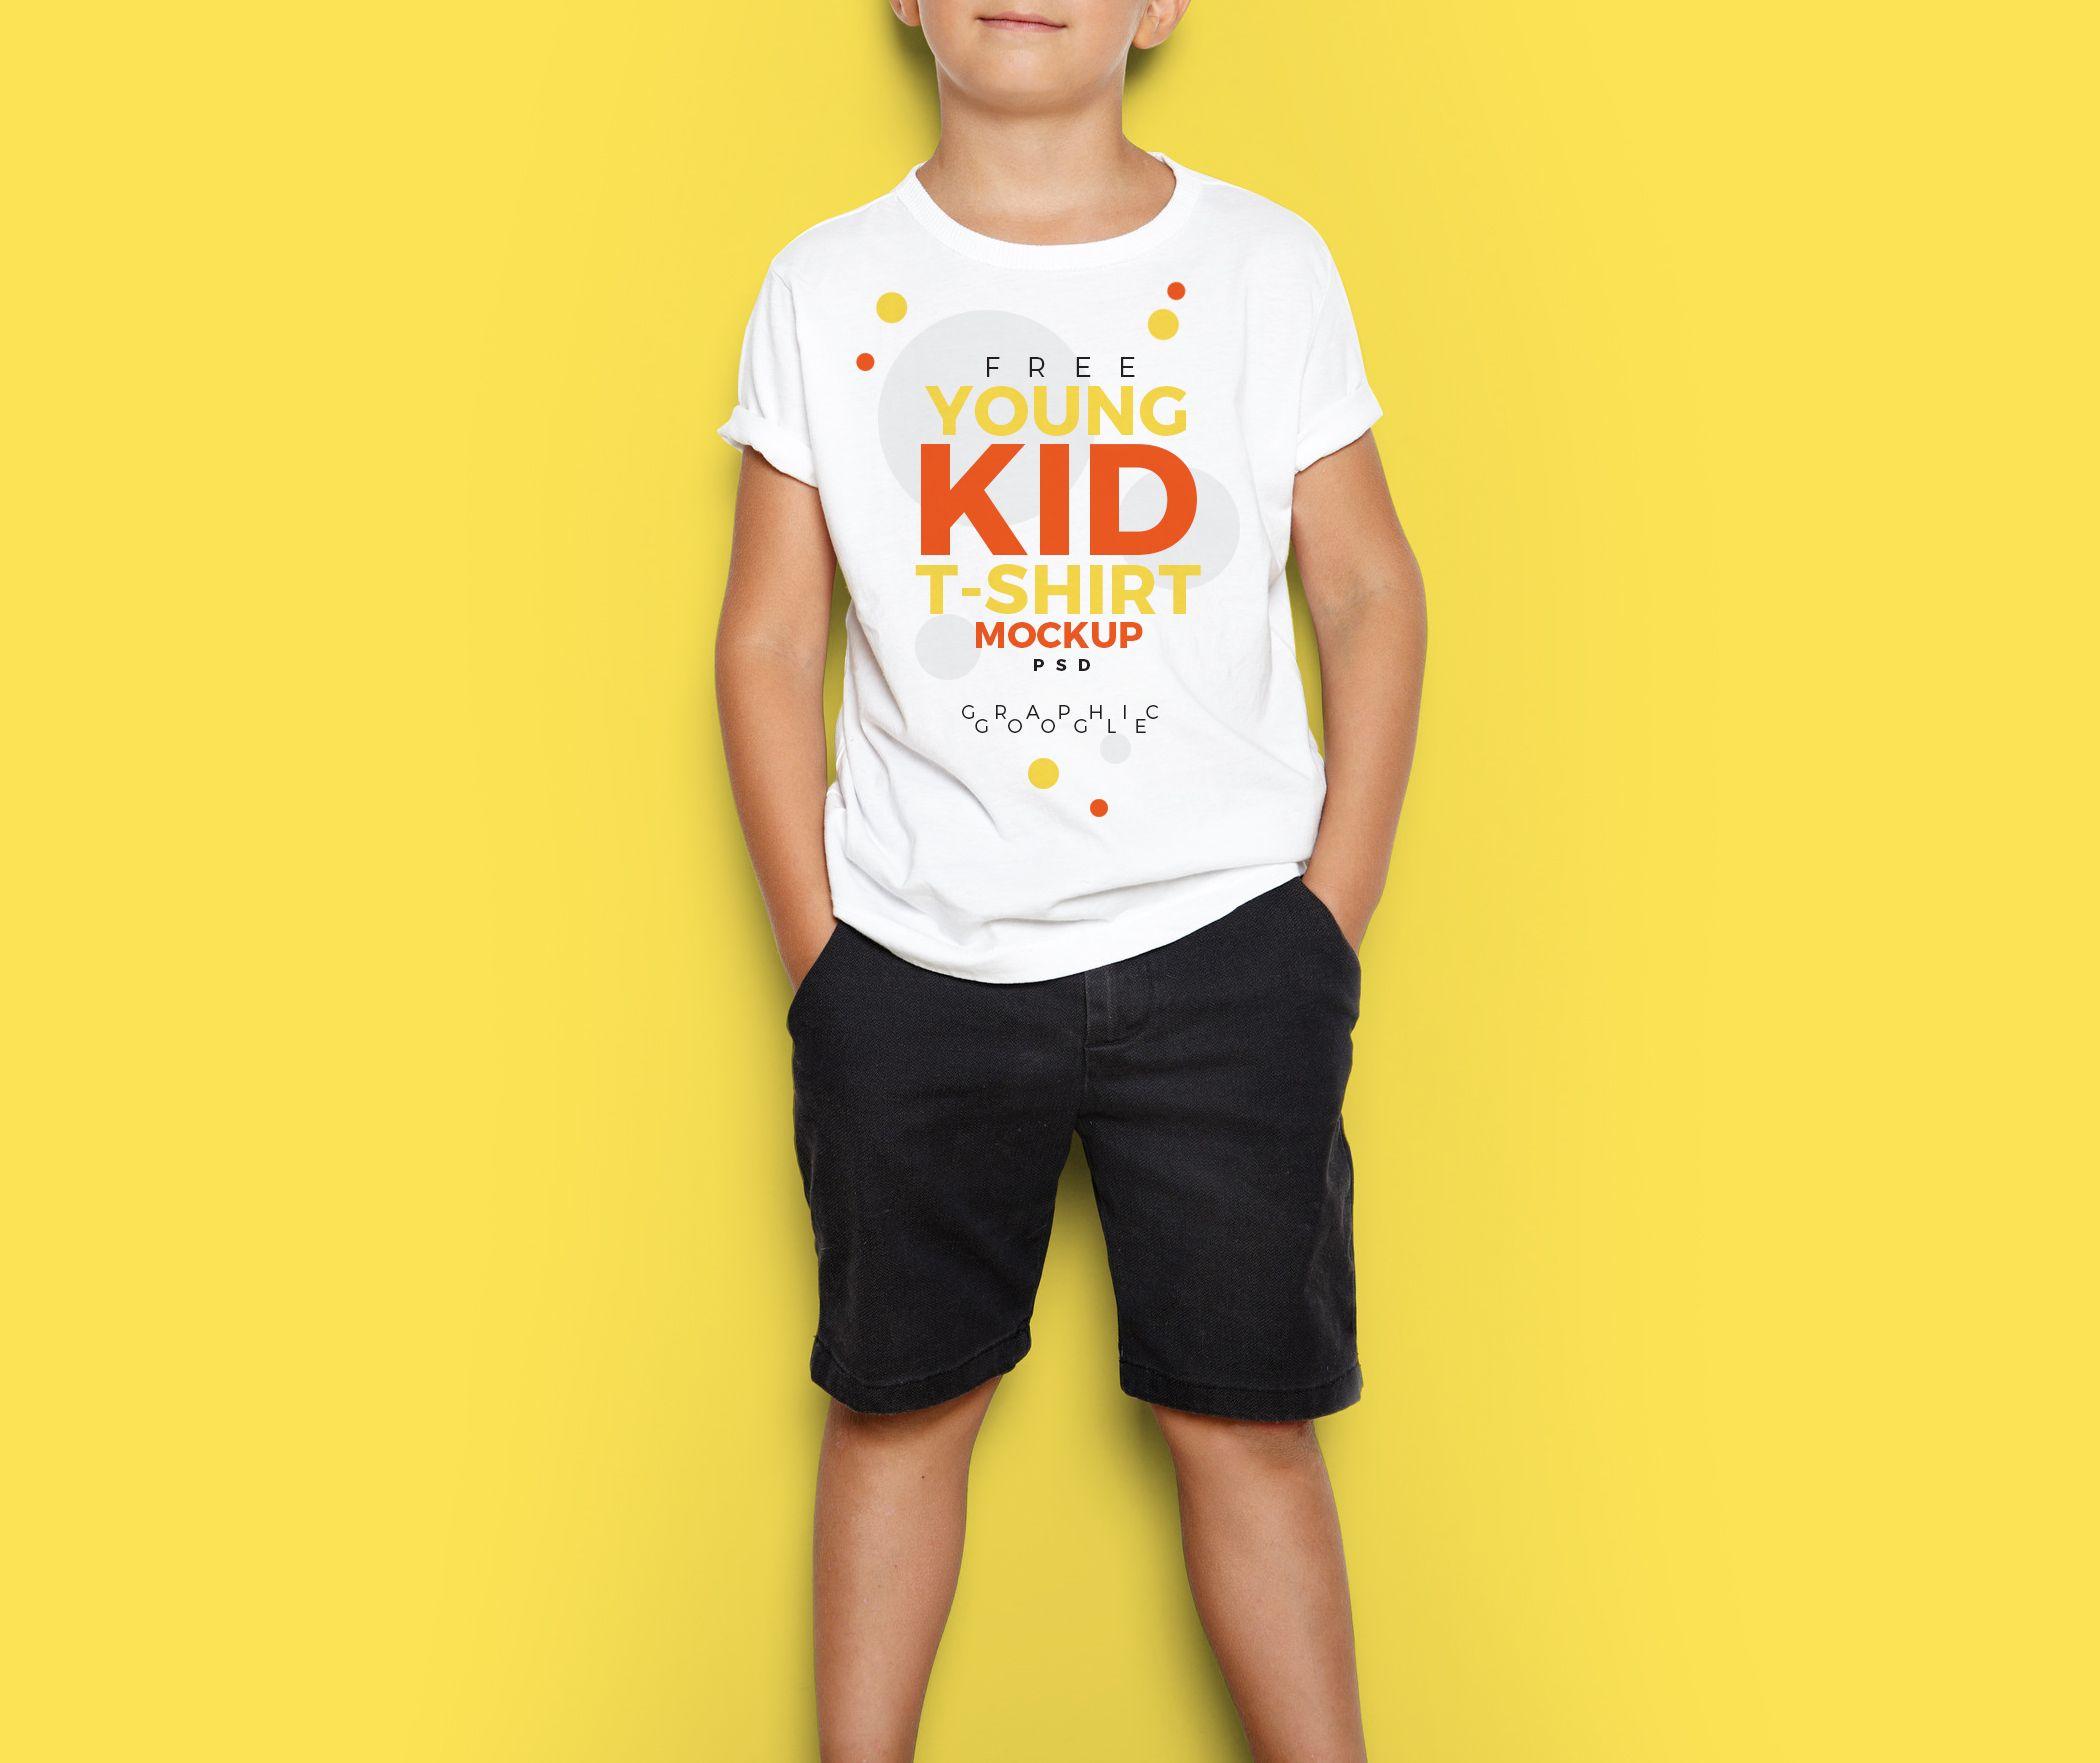 Download Free Young Kid T Shirt Mockup Psd Kaos Anak Pengasuh Anak